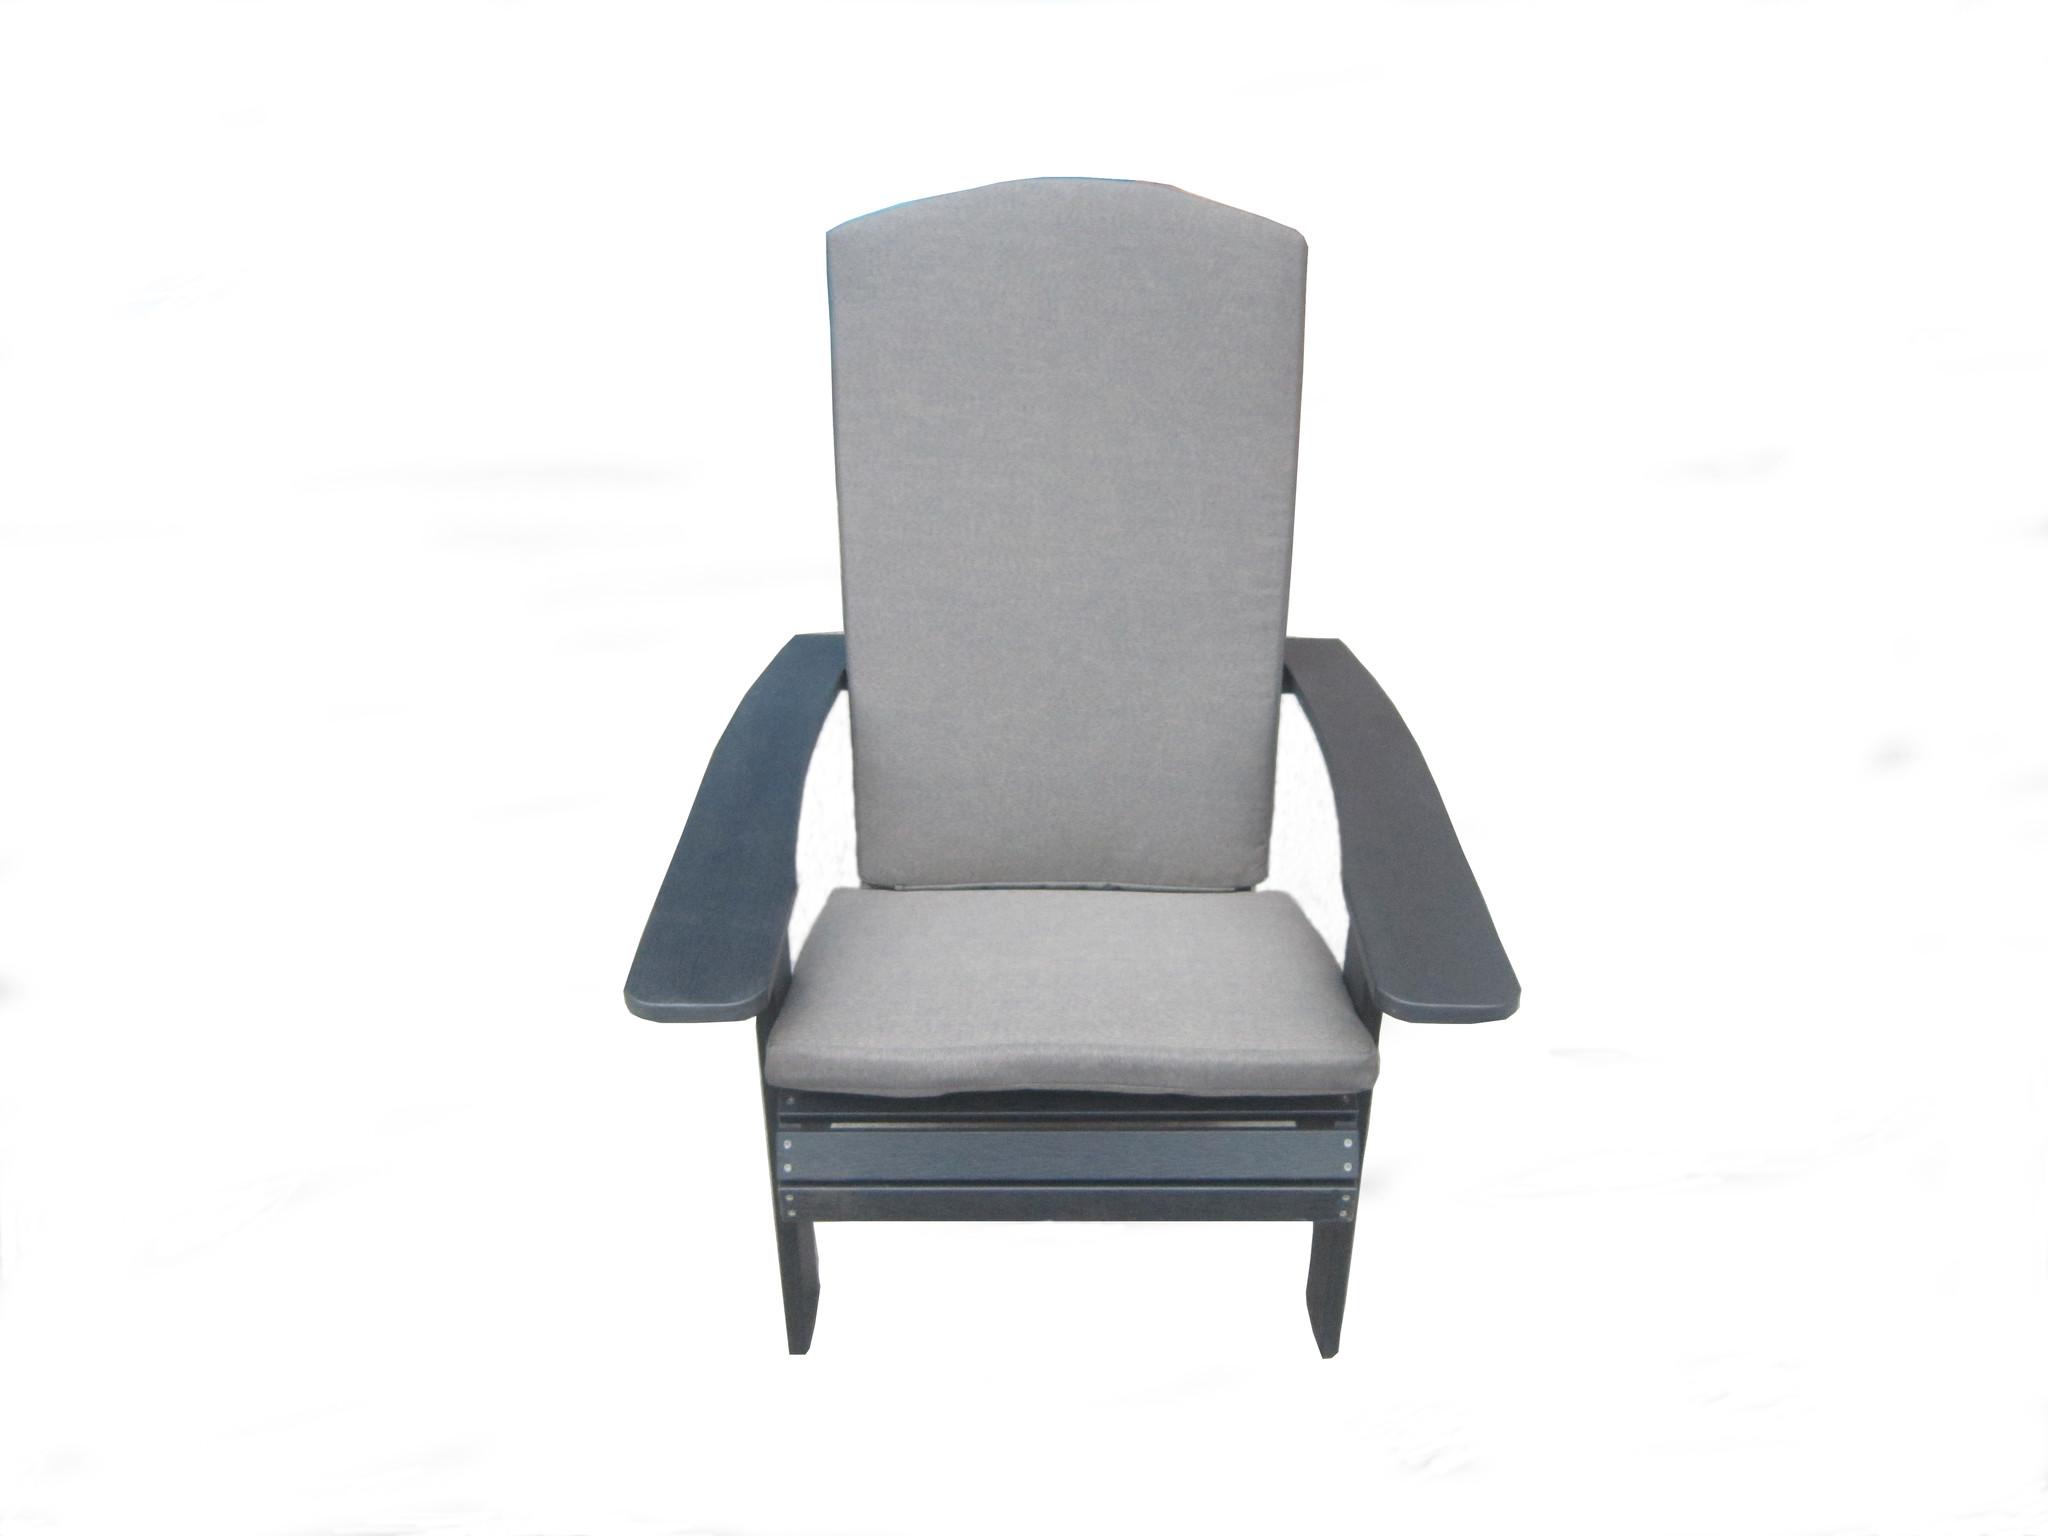 Adirondack Chair Kussens.Adirondack Kussen Grijs Garden Interiors